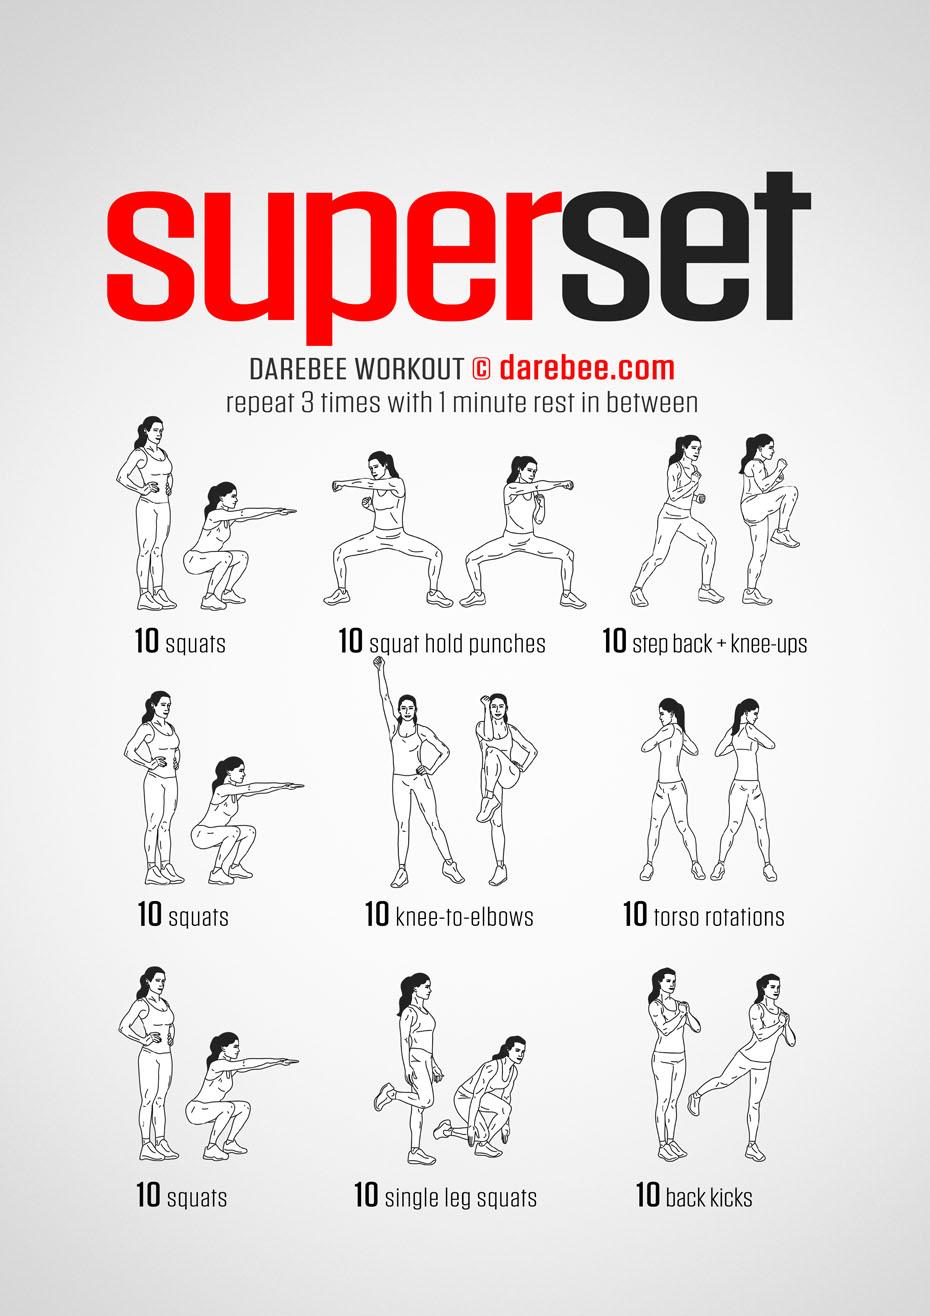 Superset Workout